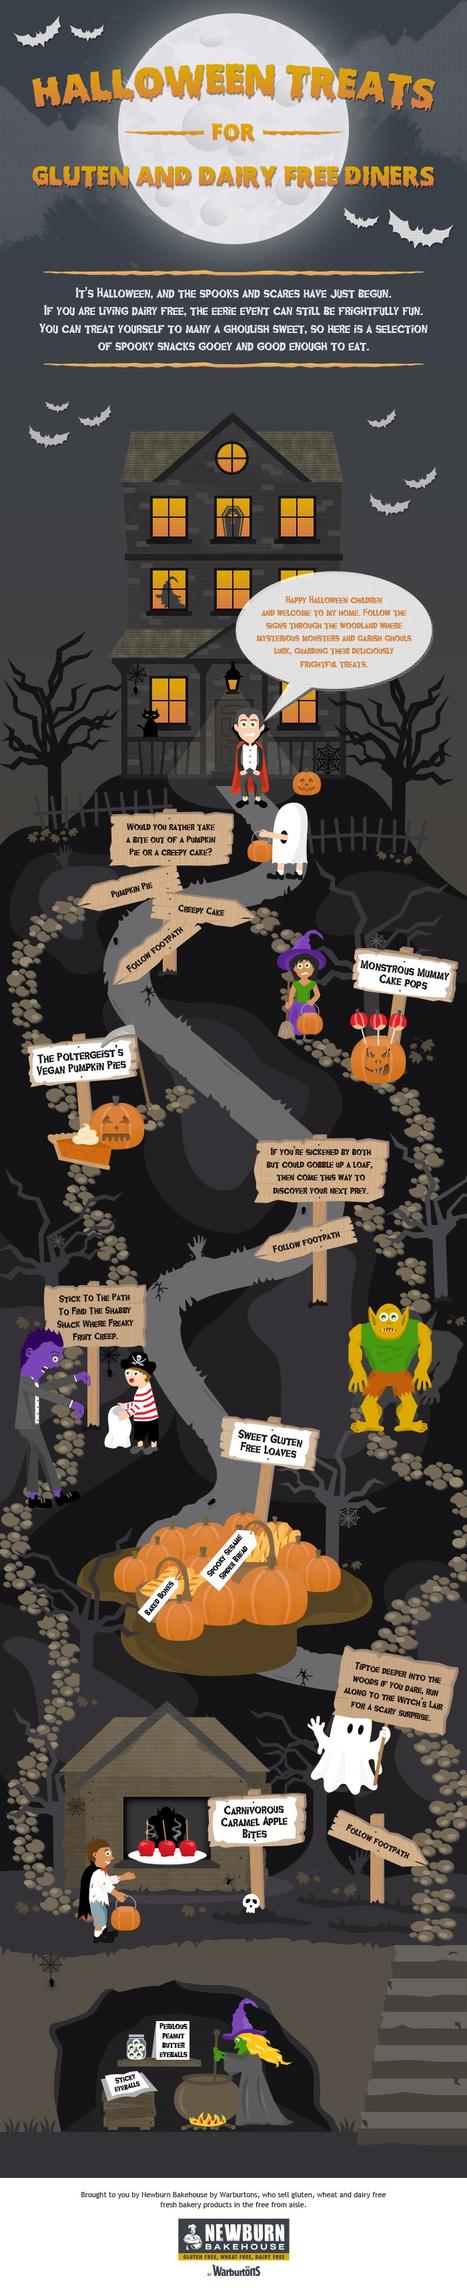 Jimbo's Homemade: Halloween | Etc. | Scoop.it